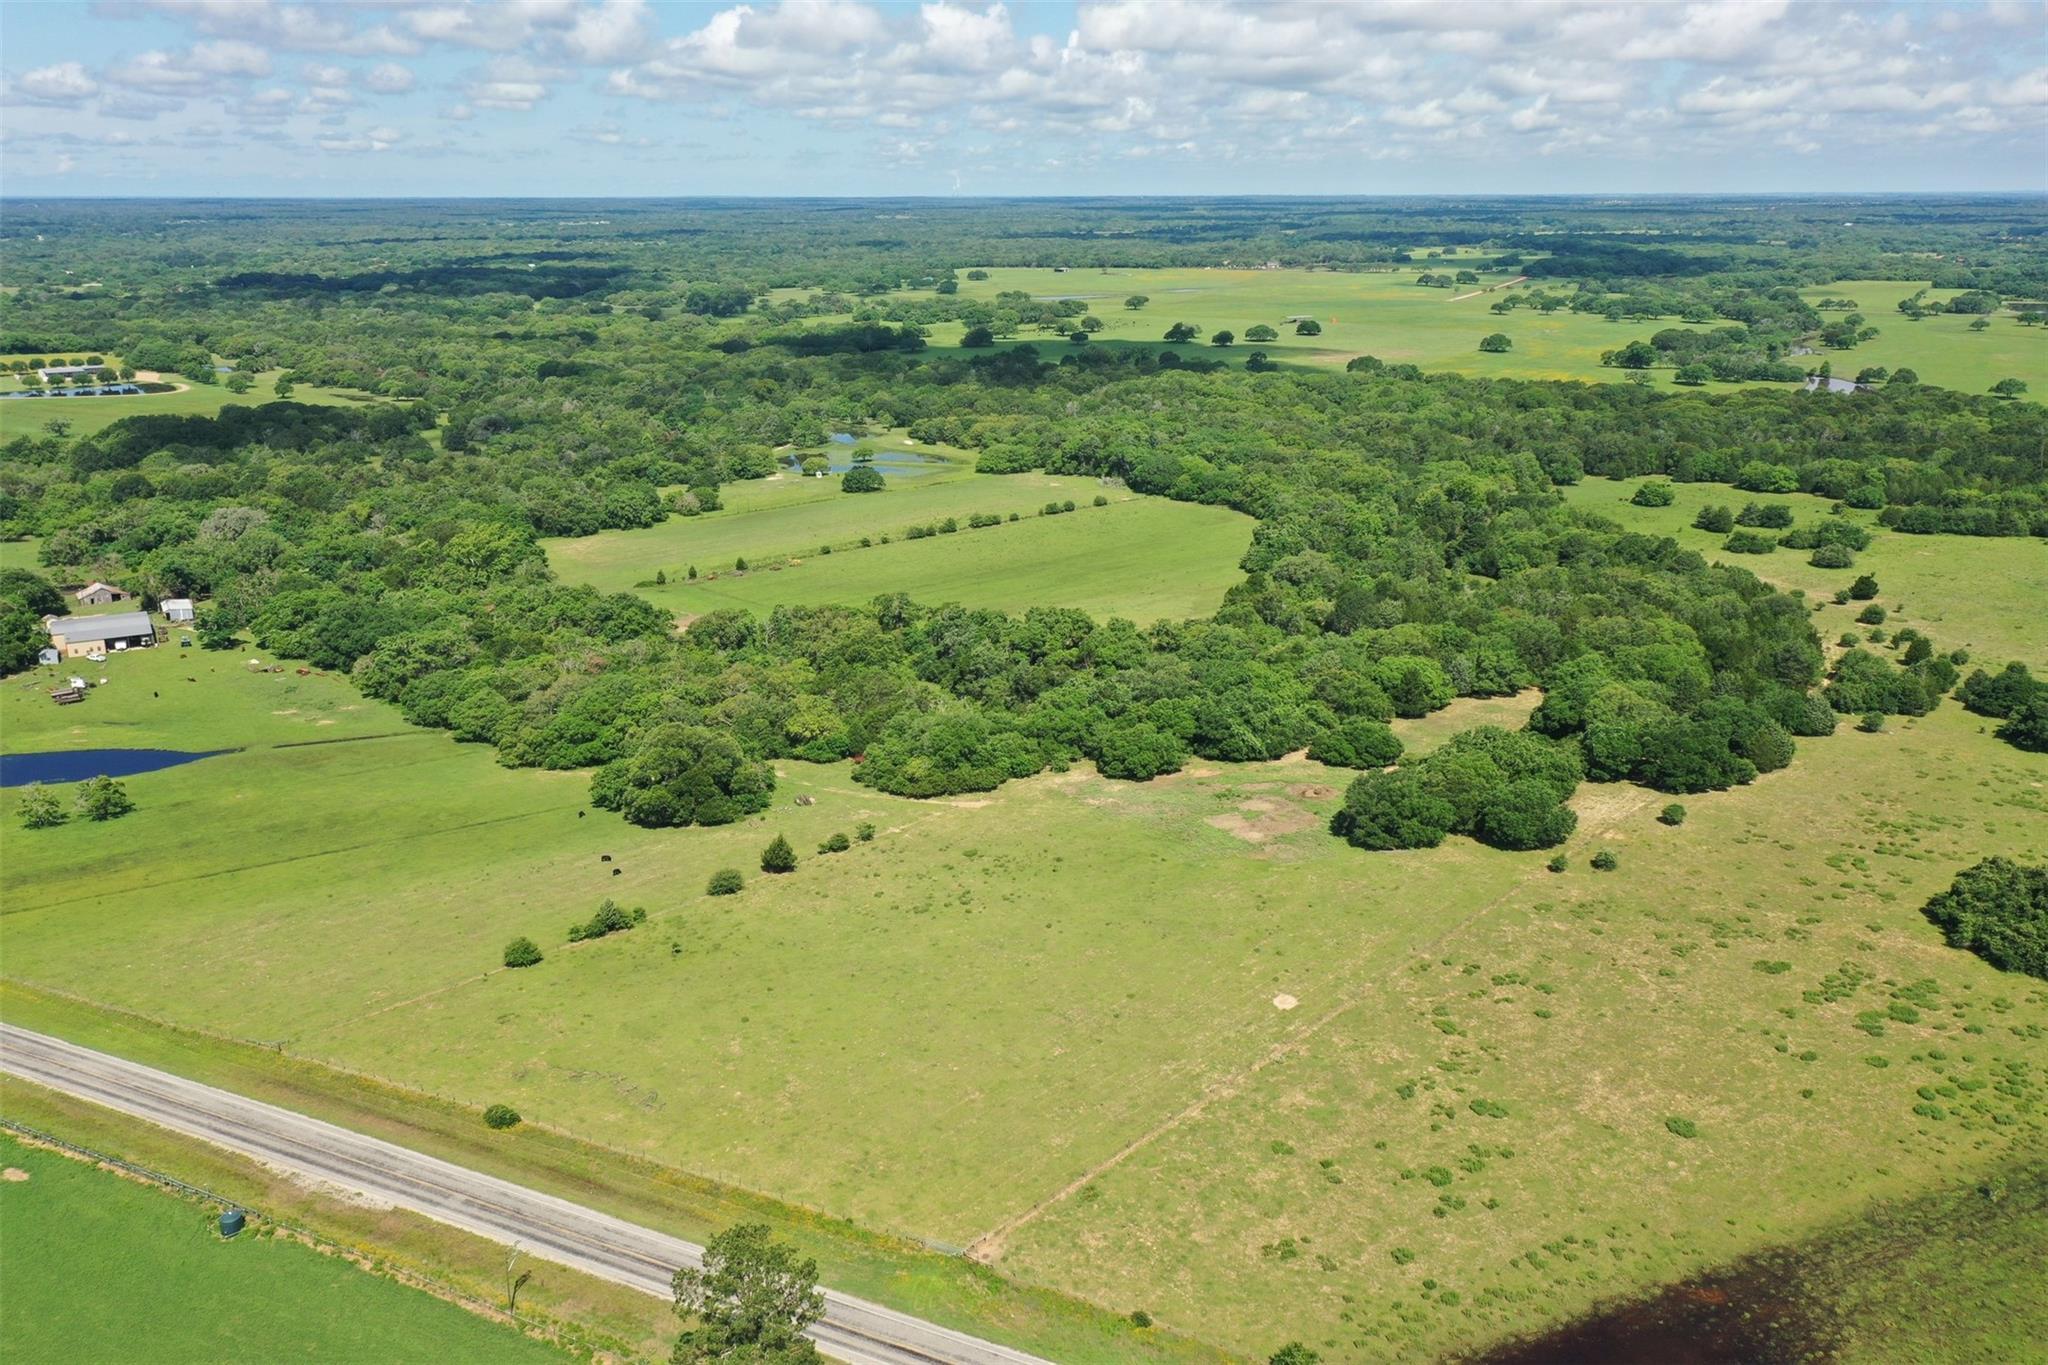 000 Fm Rd 949 Property Photo